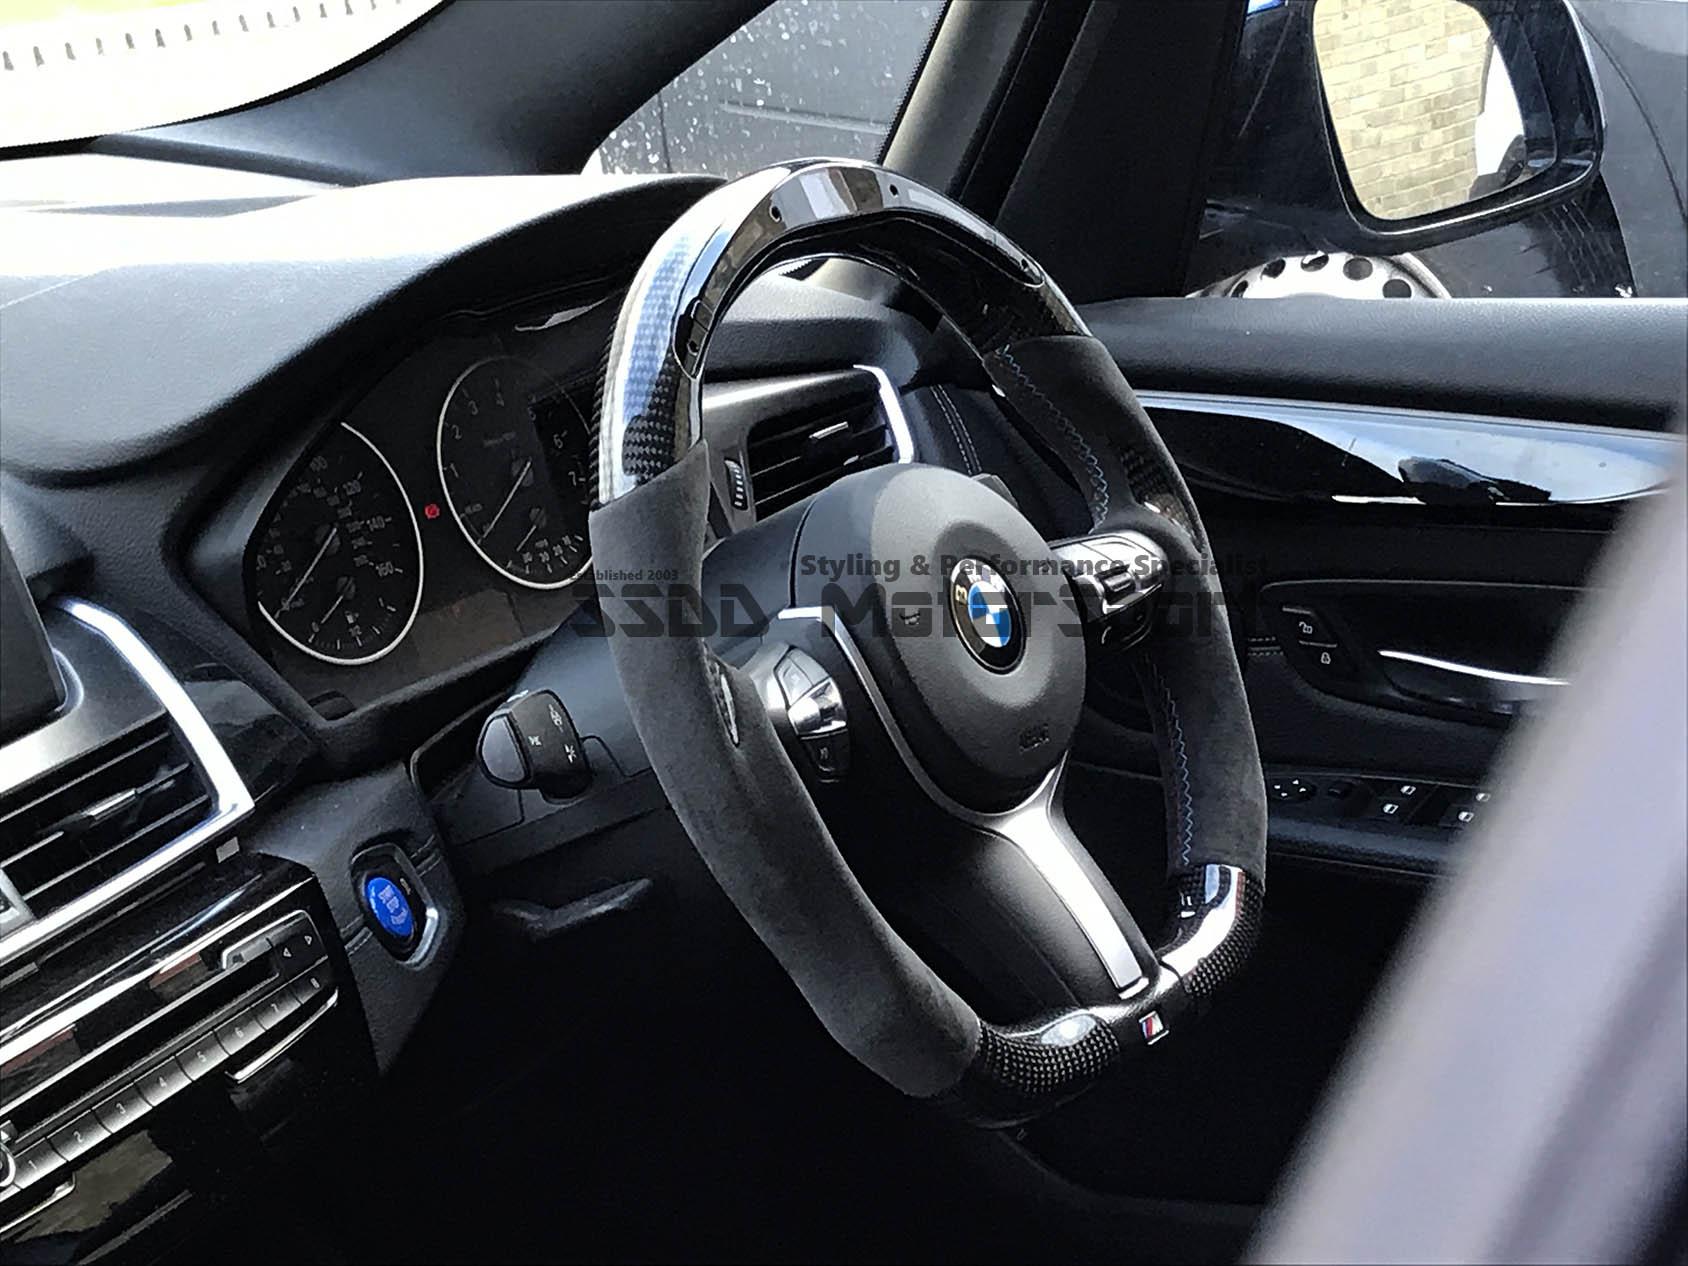 bmw-f20-f30-f32-f22-1-2-3-4-series-carbon-without-lcd-race-display-flat-bottom-flat-bottom-steering-wheel-logo-1.jpg